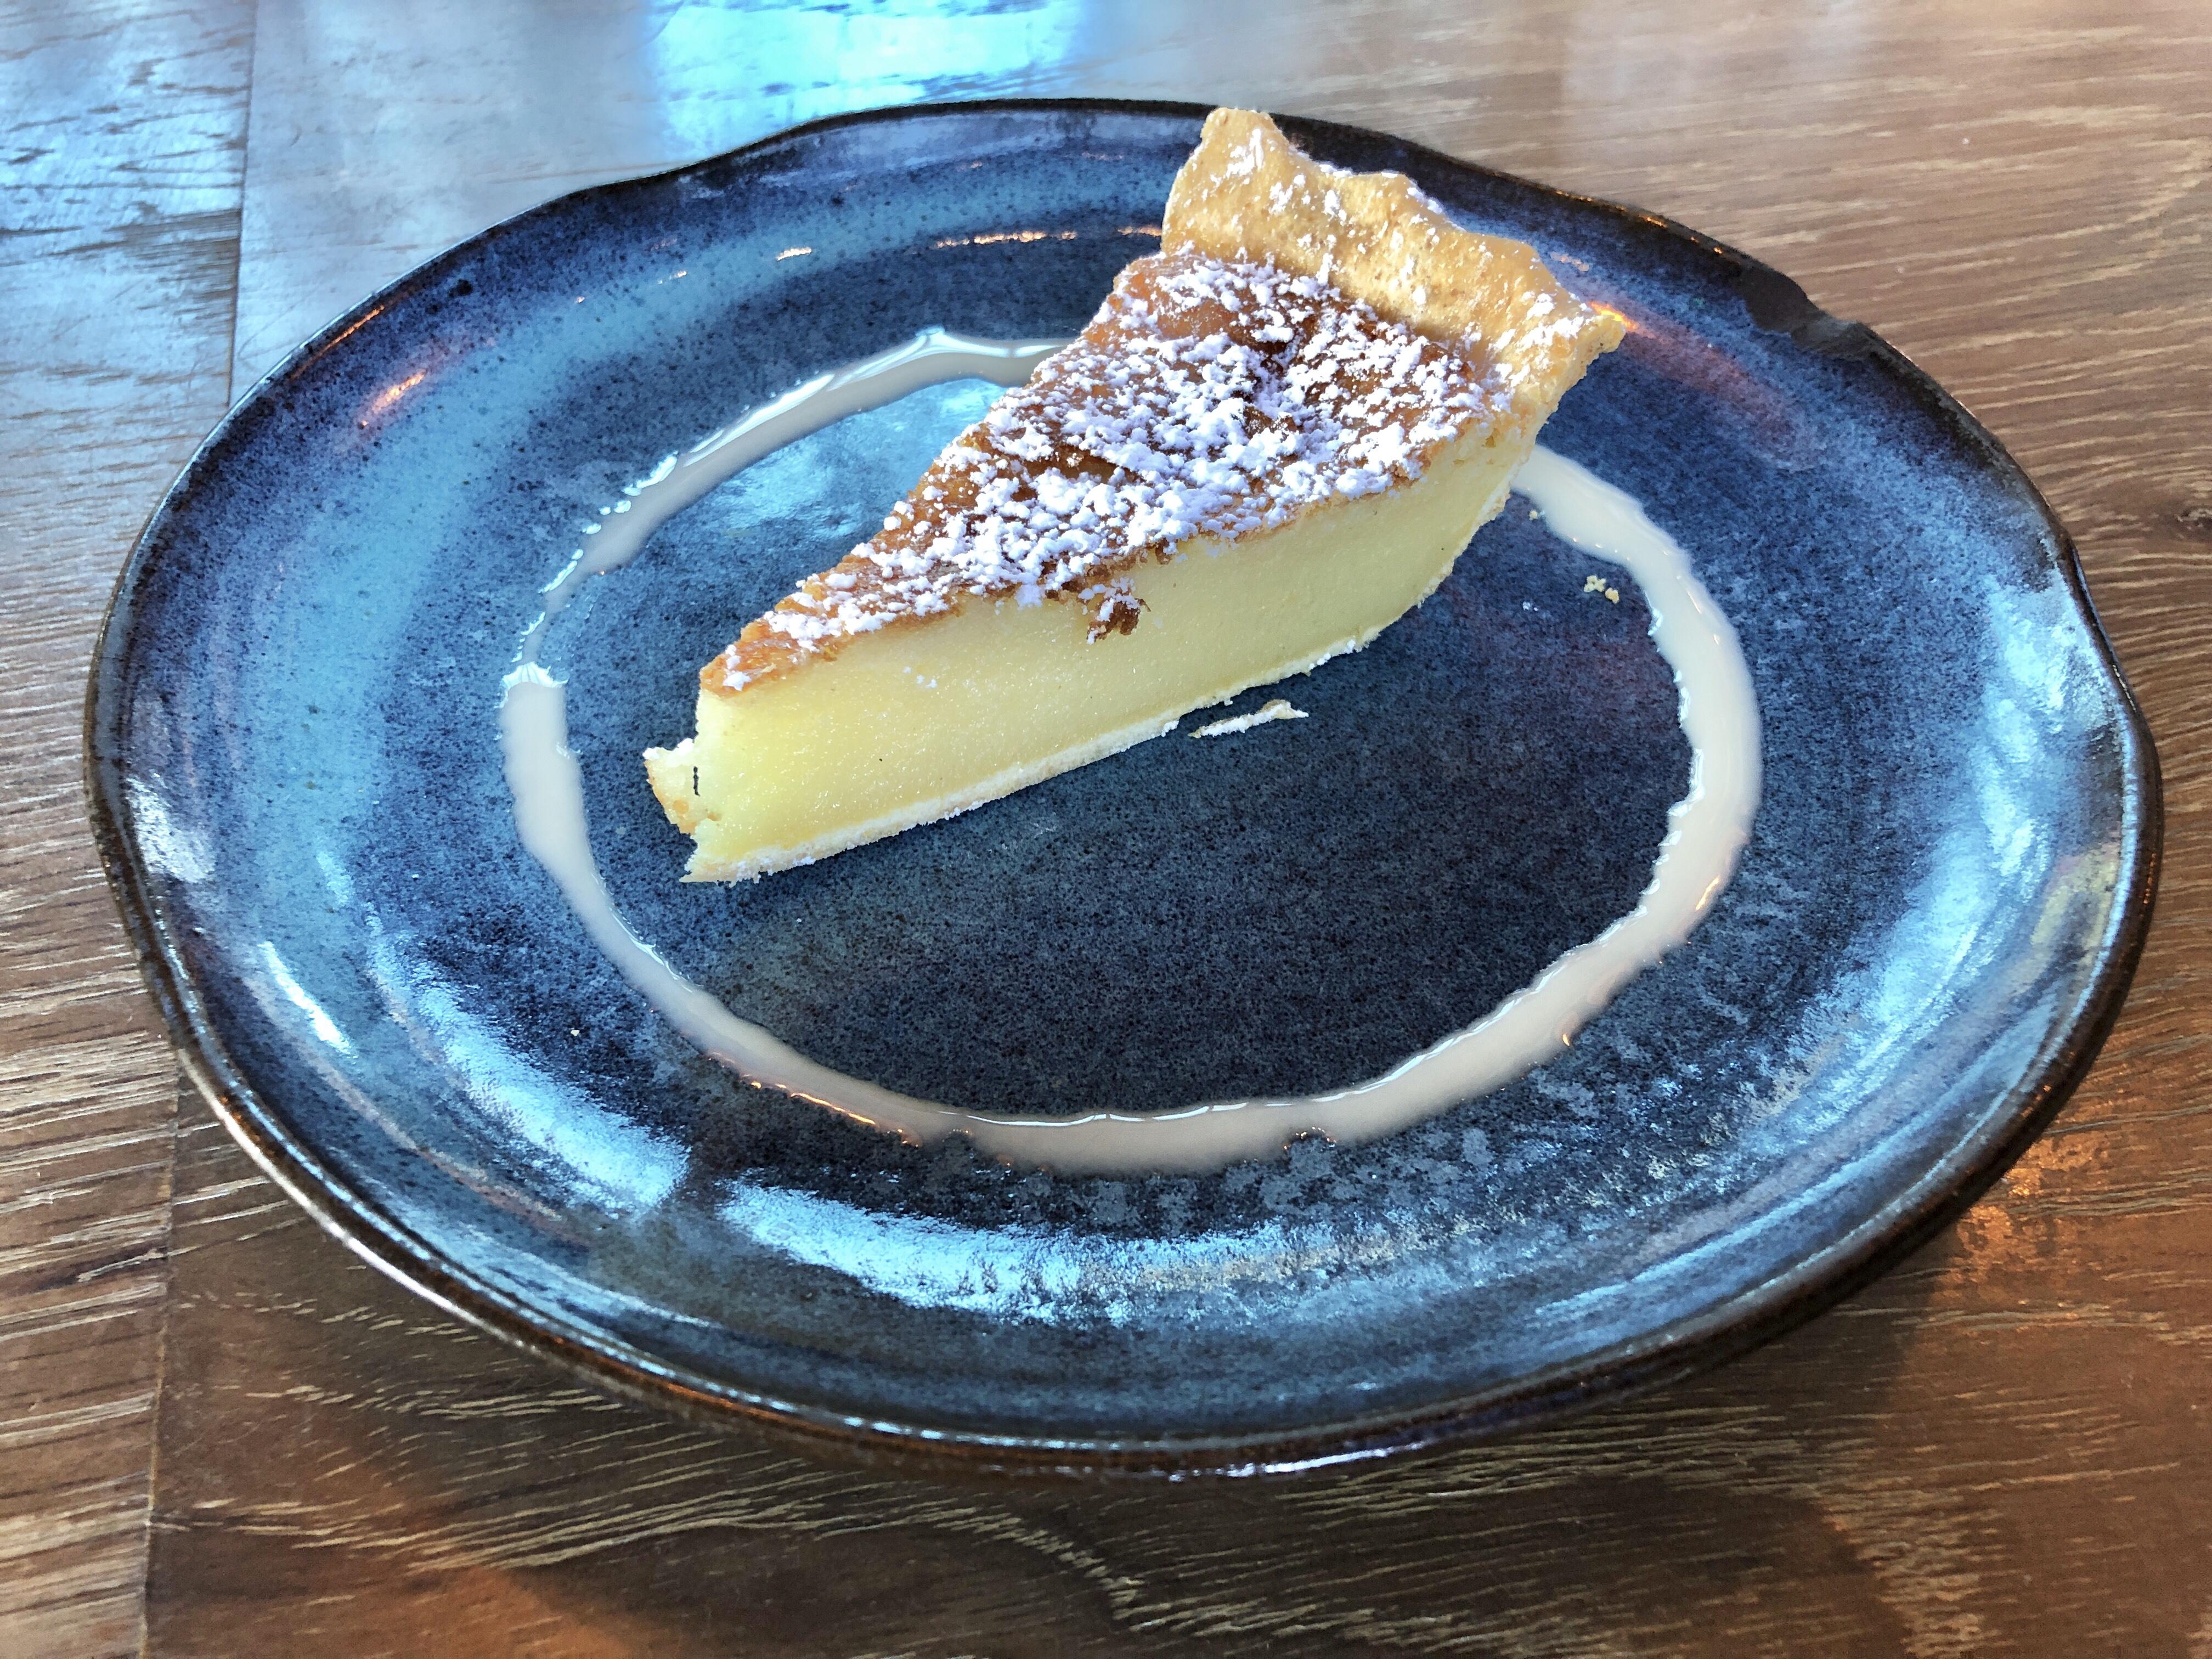 Slice of vanilla buttermilk pie at Rye Street Tavern in Port Covington, Baltimore, Maryland